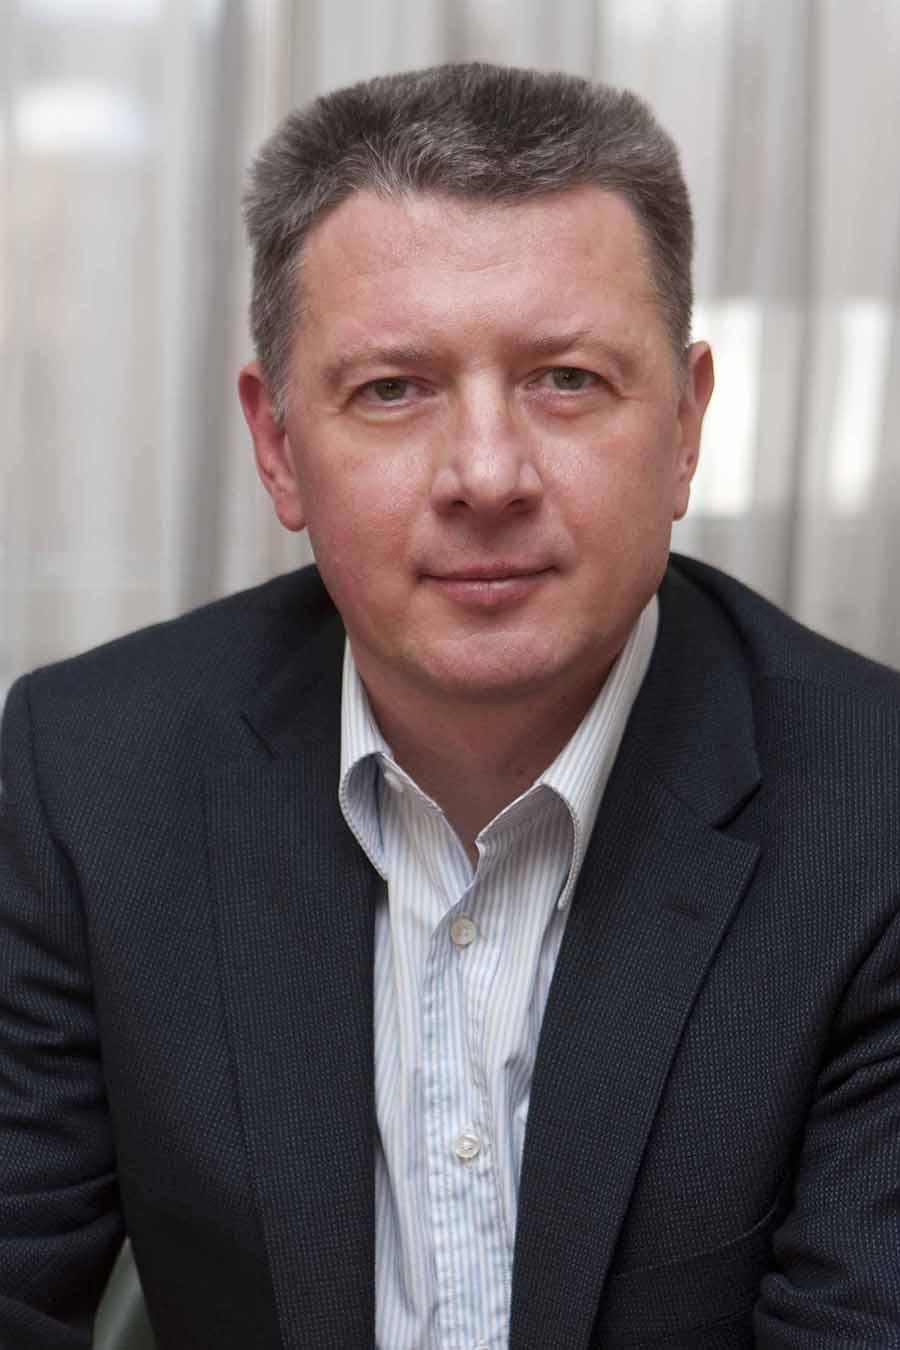 Шляхтин Дмитрий Анатольевич